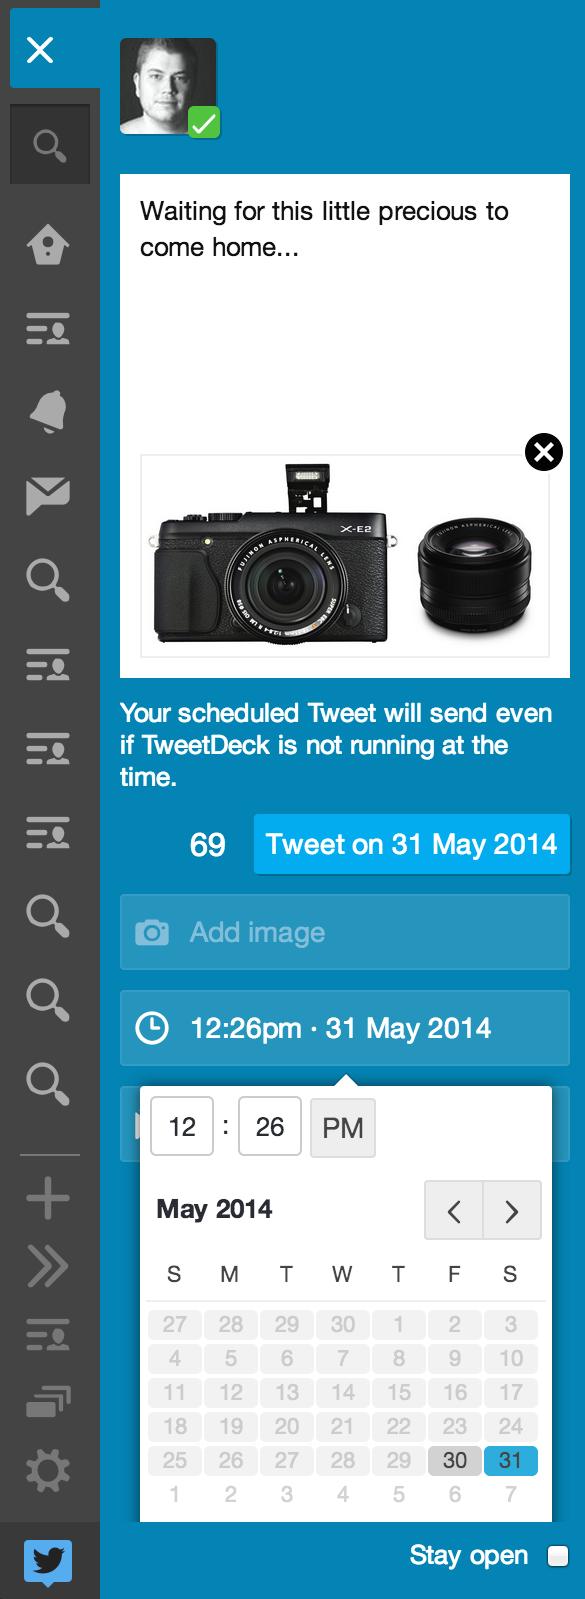 Schemalägg tweets med bilder i TweetDeck